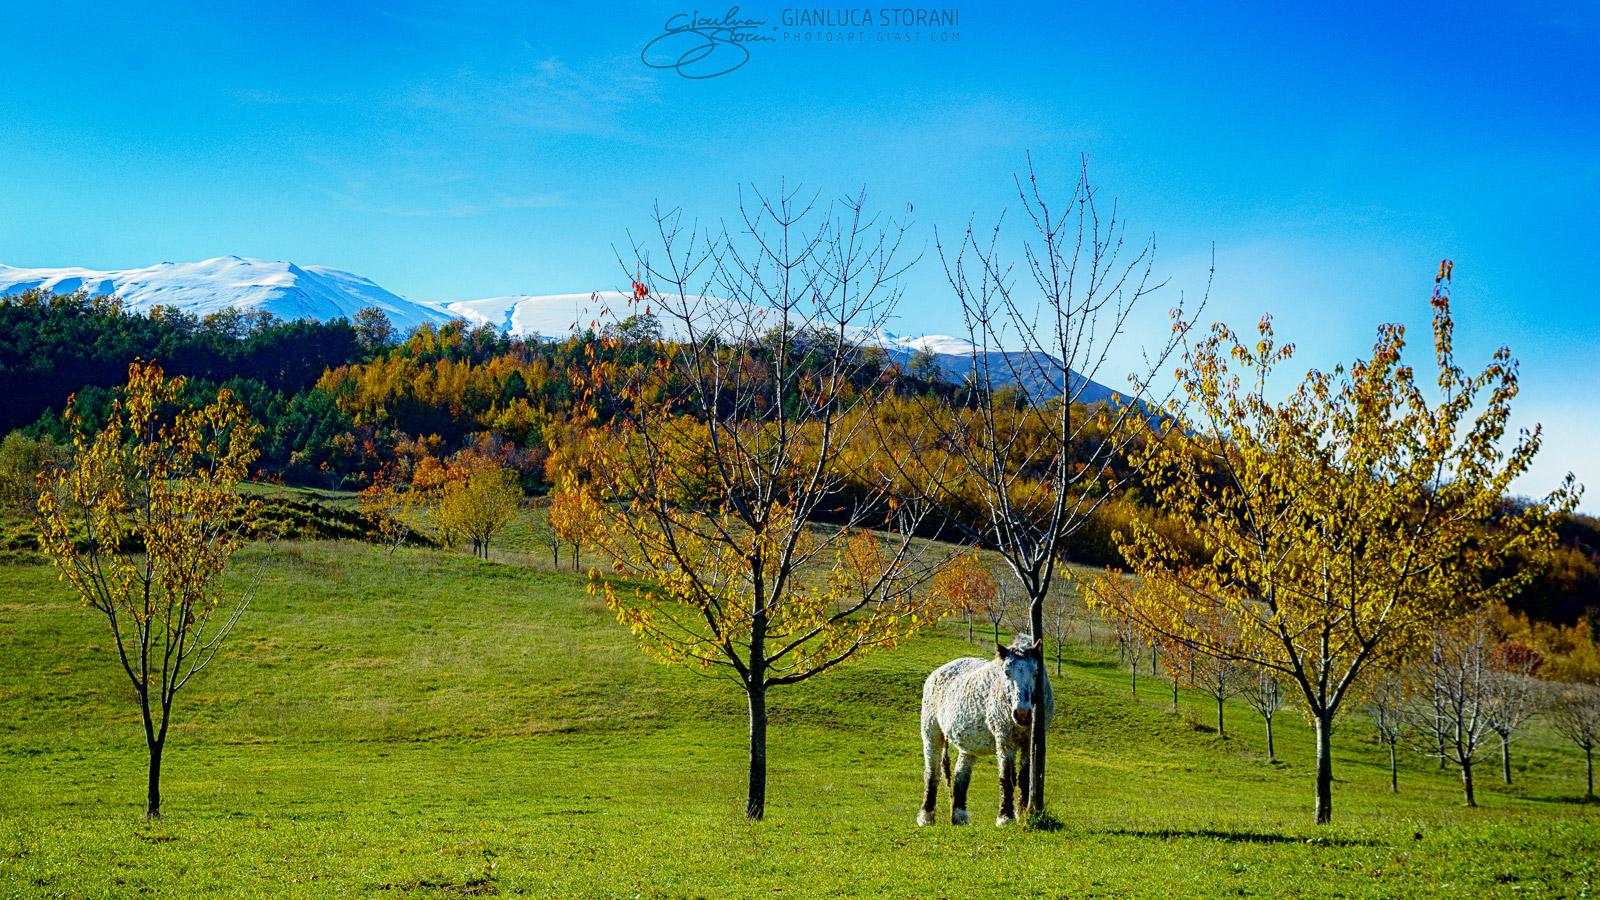 Scorcio d'autunno sui Sibillini - Gianluca Storani Photo Art (ID: 4-6112)